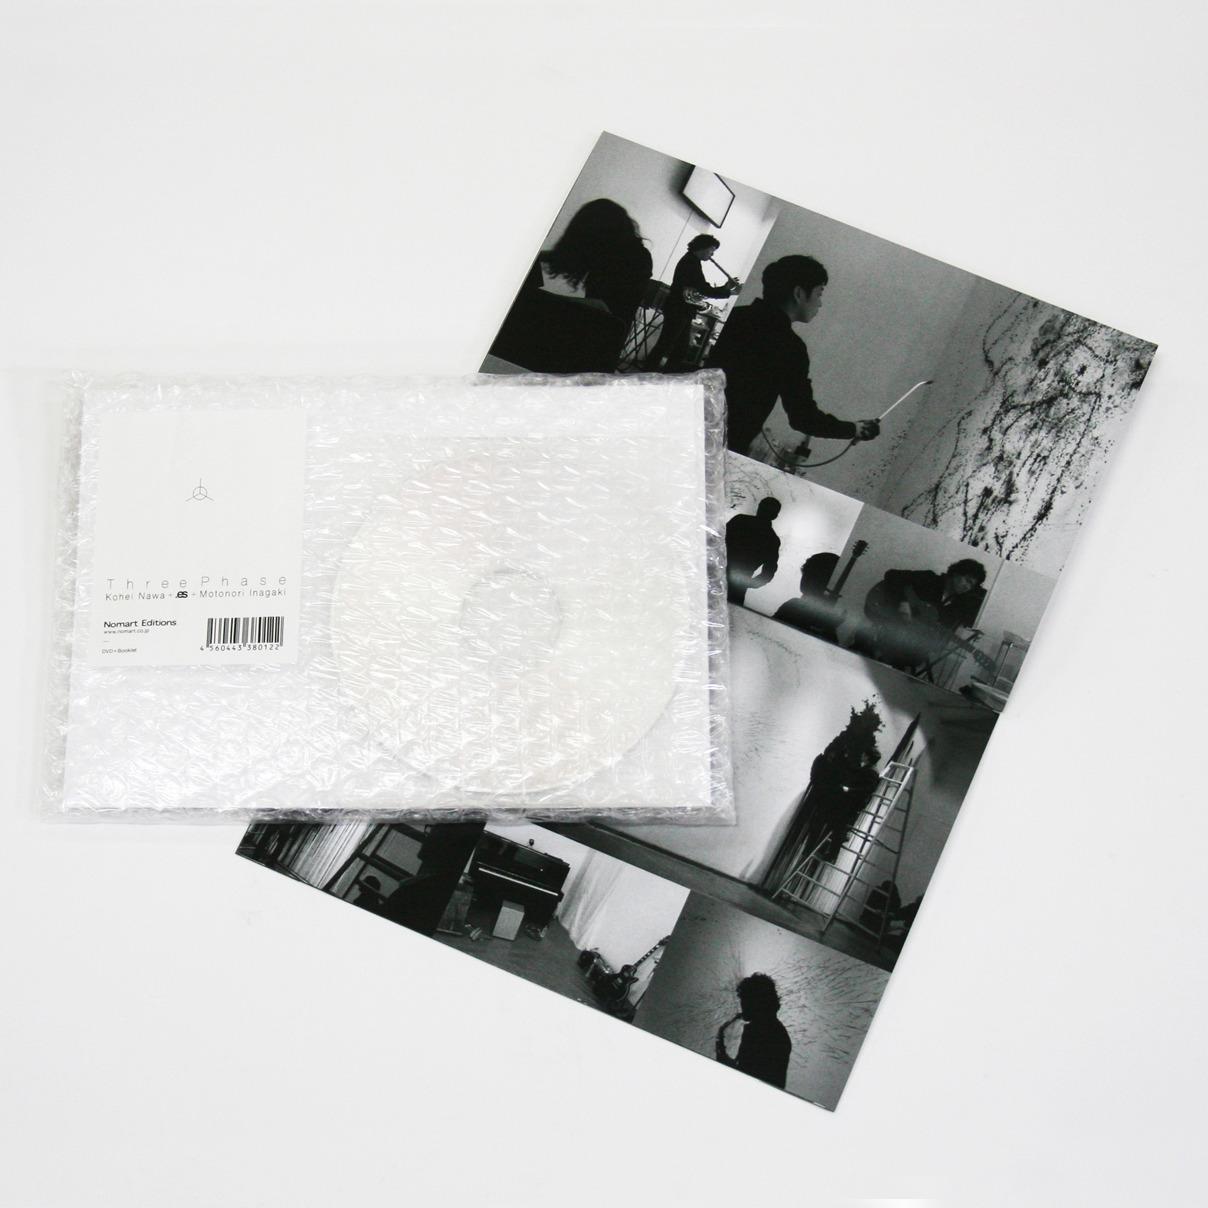 名和晃平+.es+稲垣元則「Three Phase: Kohei Nawa+.es+Motonori Inagaki」